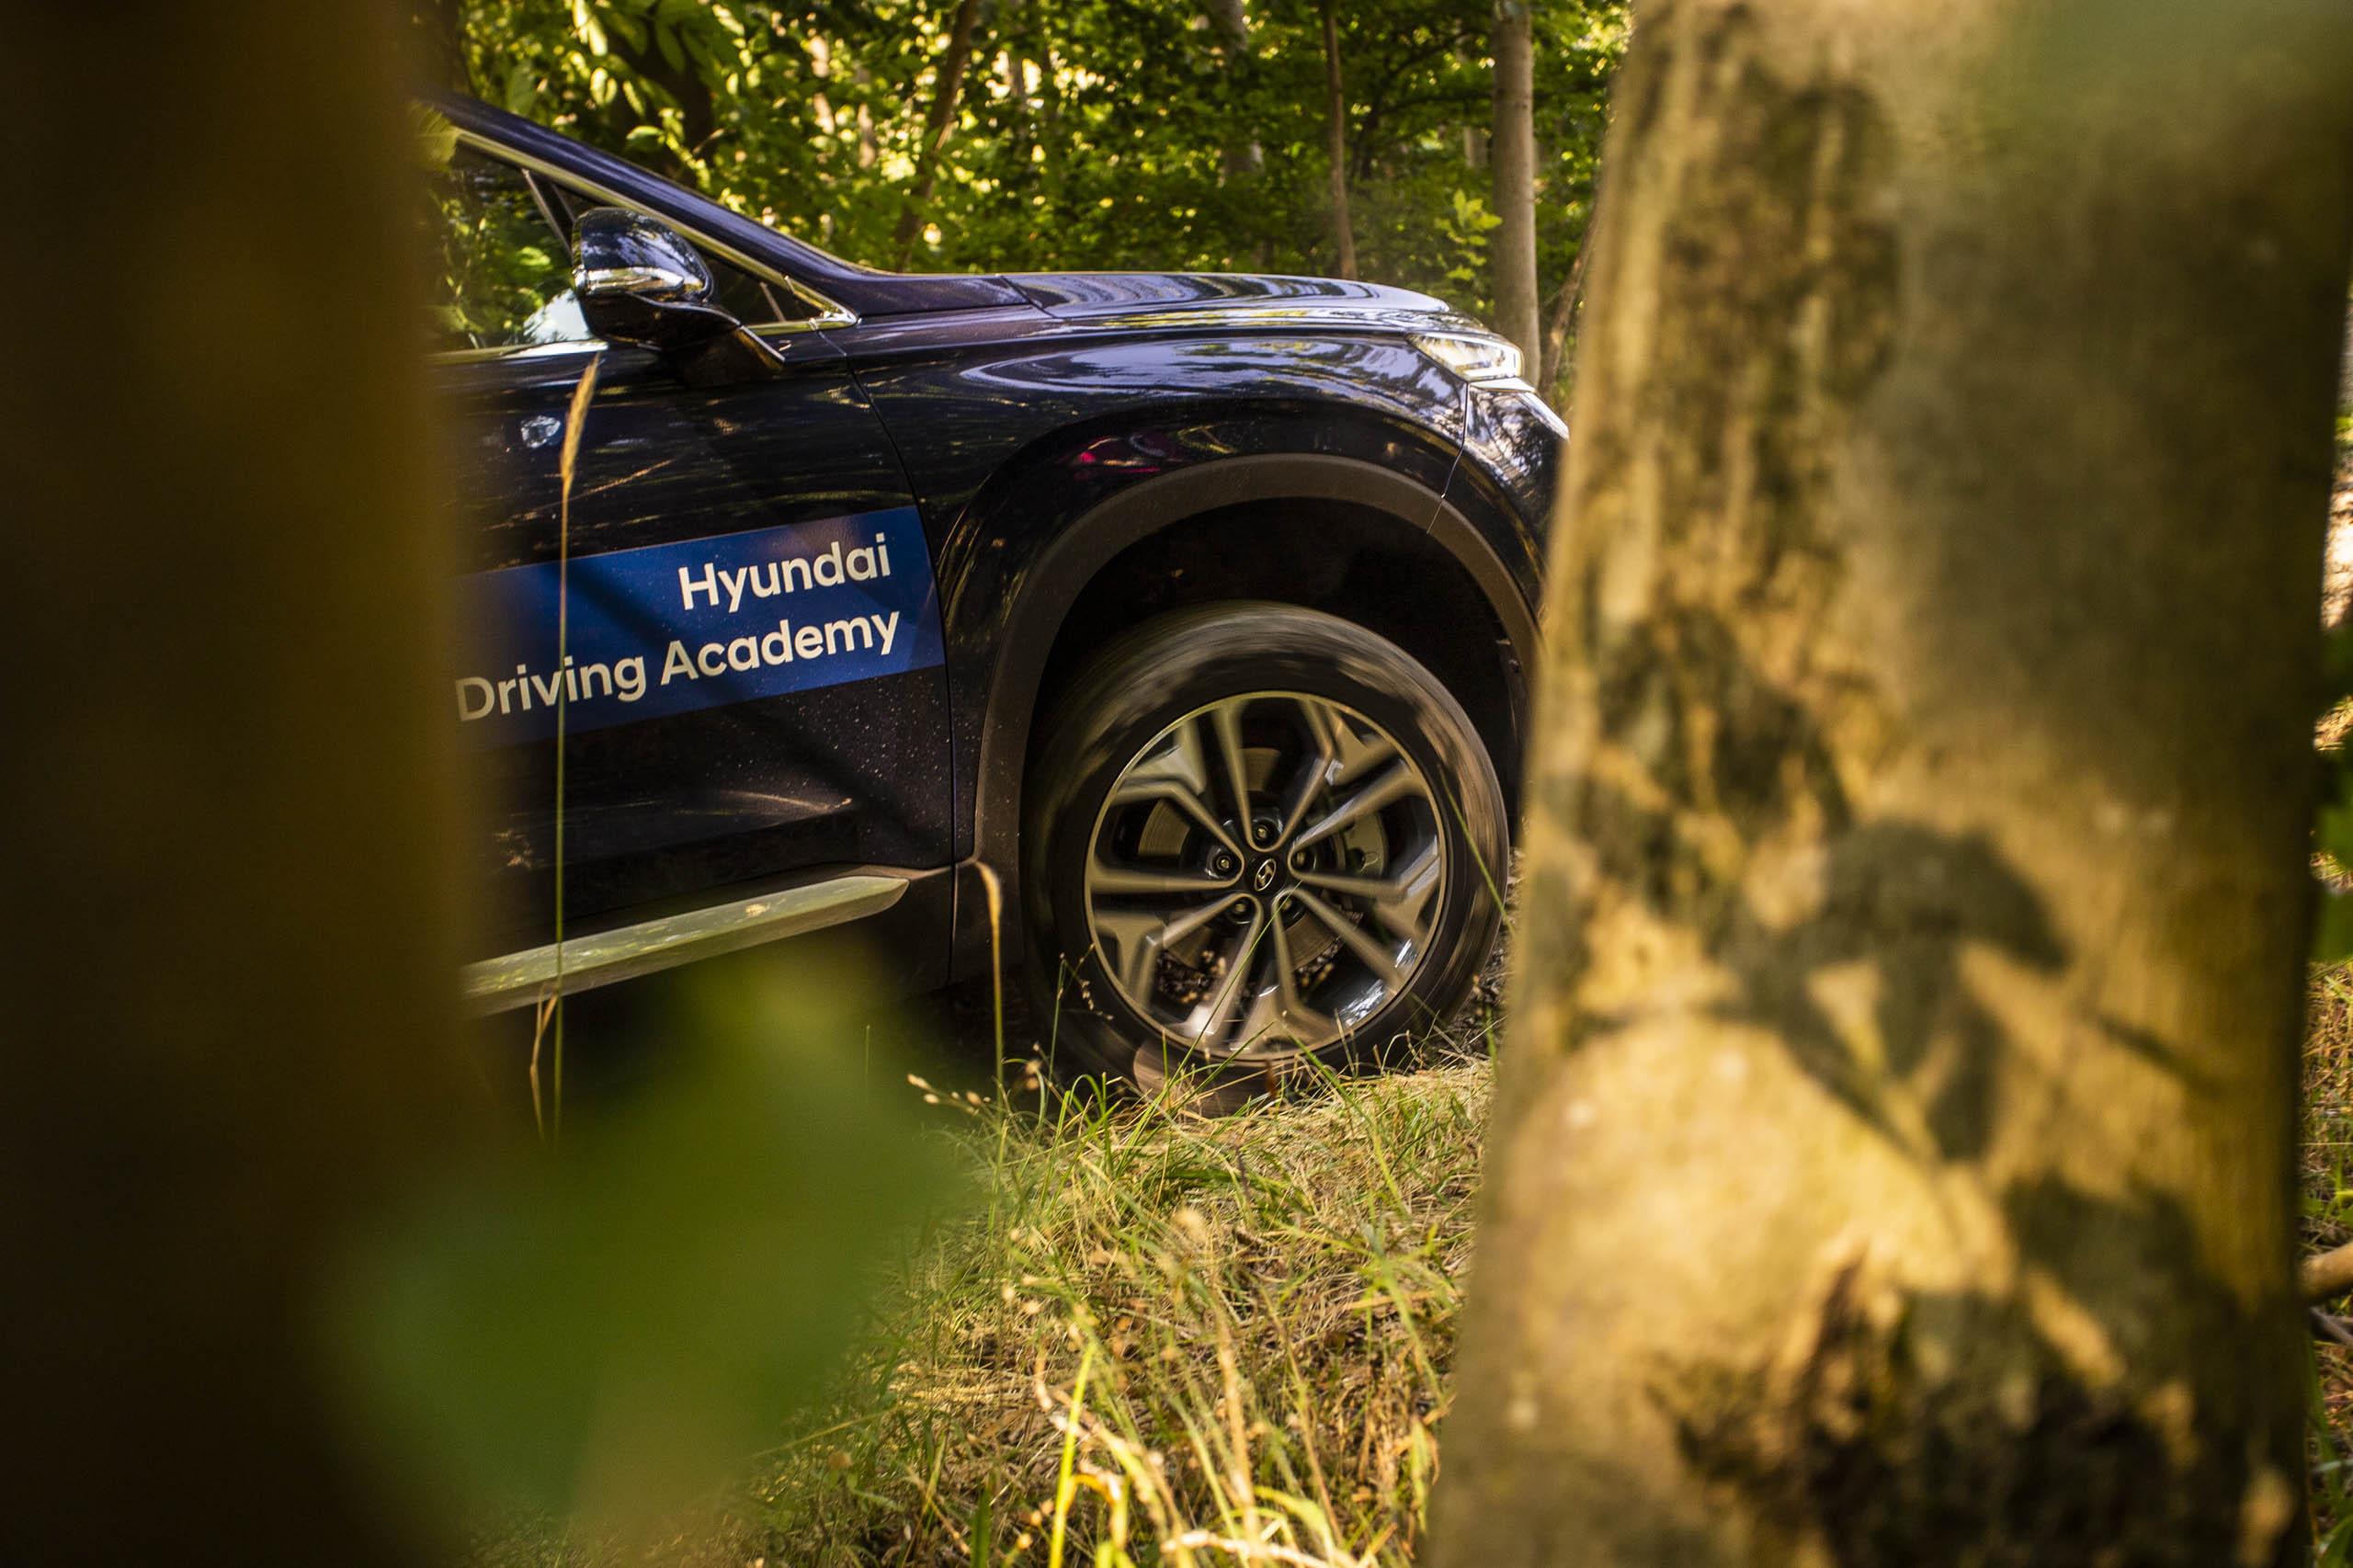 Hyundai hinter Bäumen